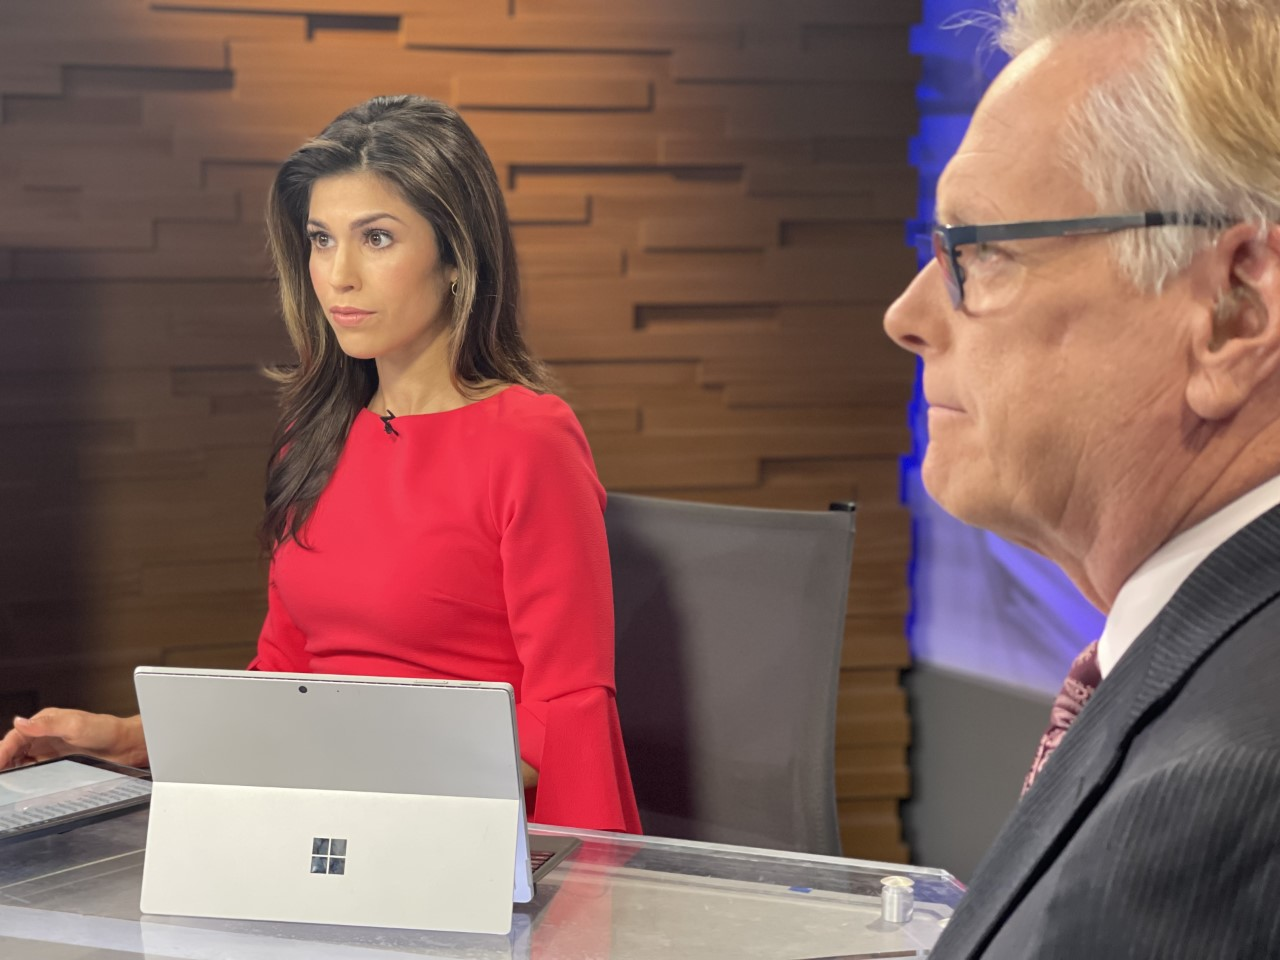 KXAN anchor Britt Moreno is finally back home in Austin